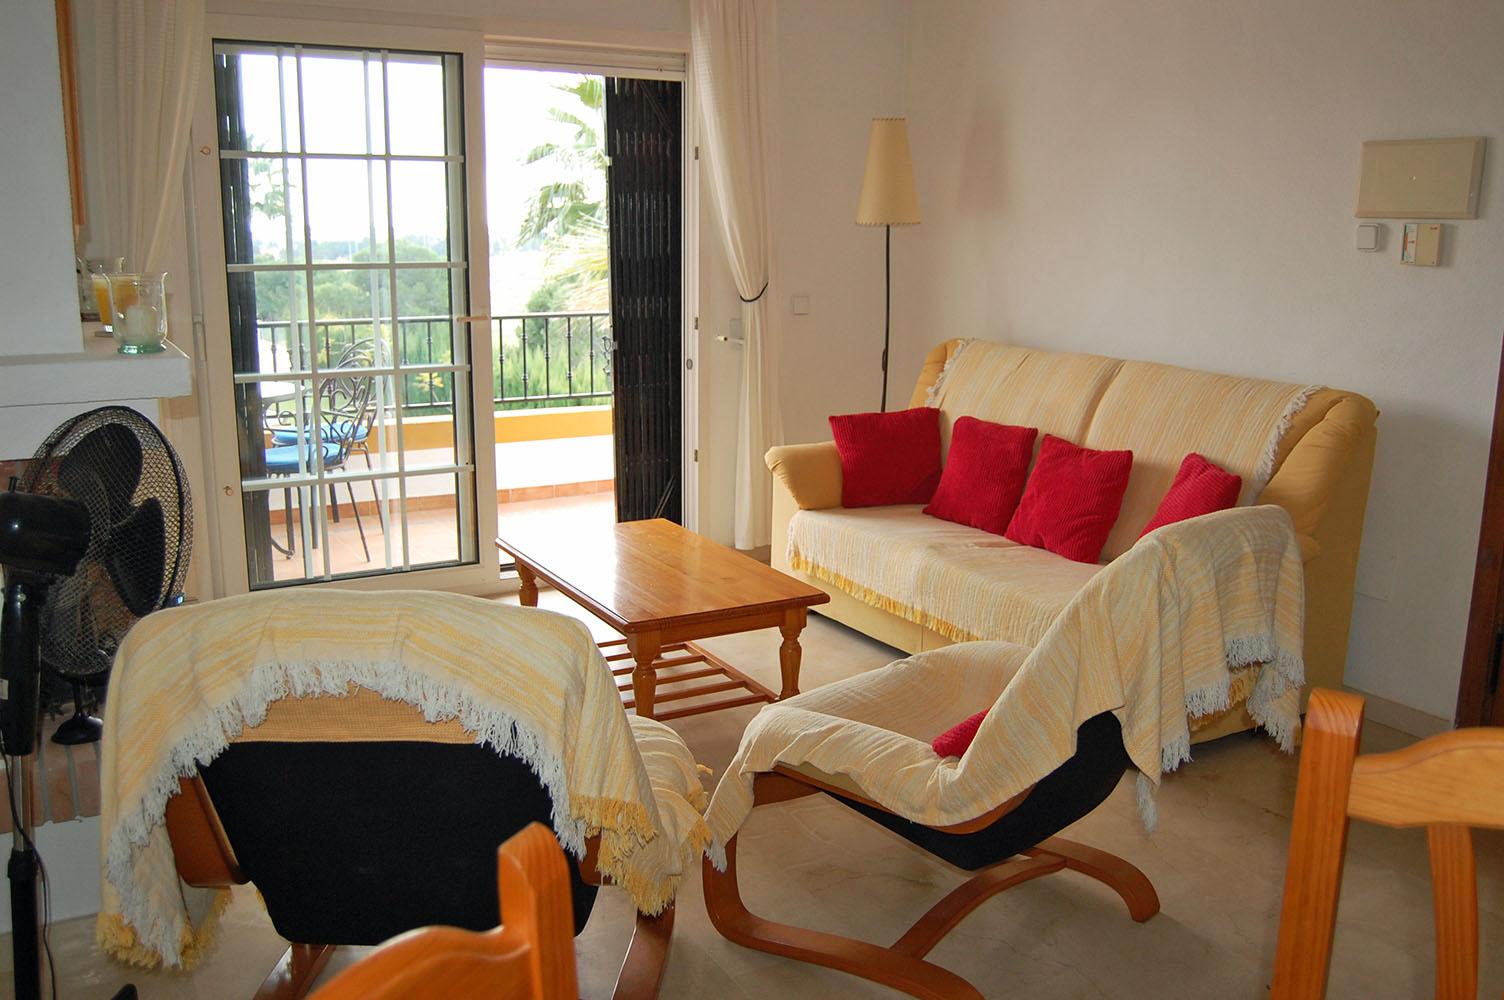 ITSH Property Spacious livingroom of the apartment in Los Dolses 4